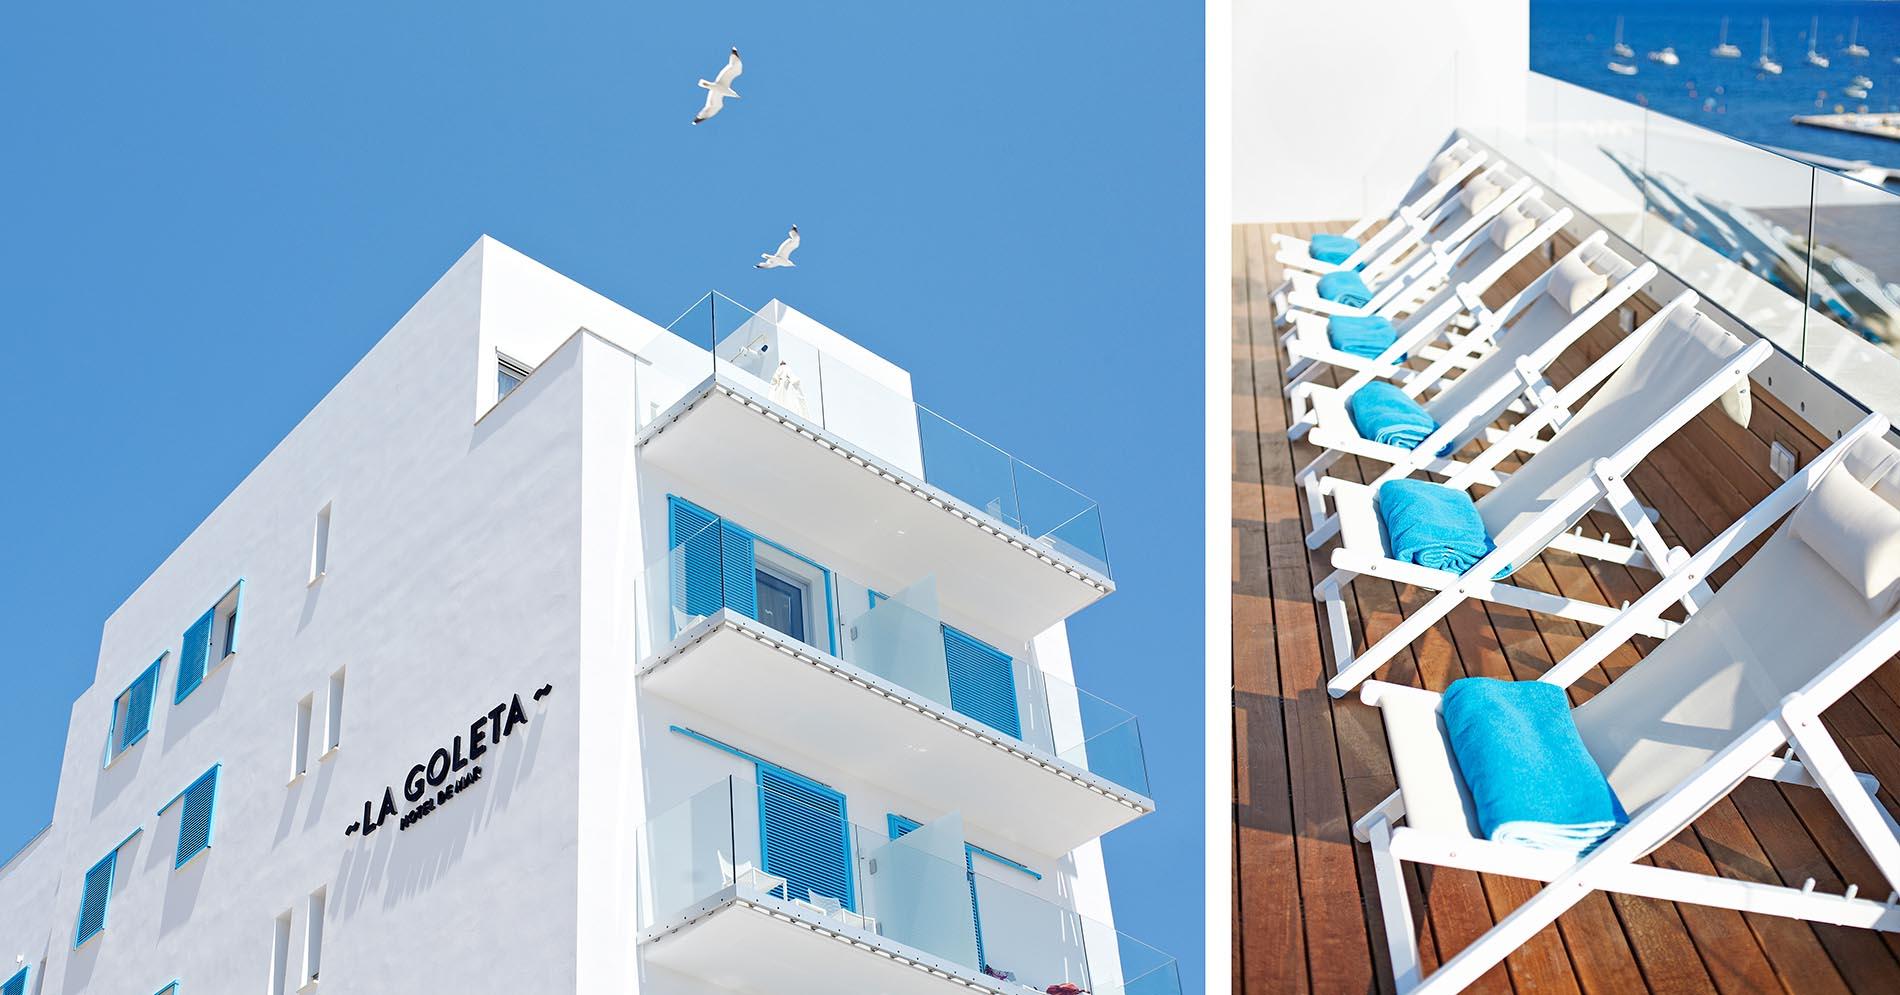 La Goleta hotel de mar branding exteriores